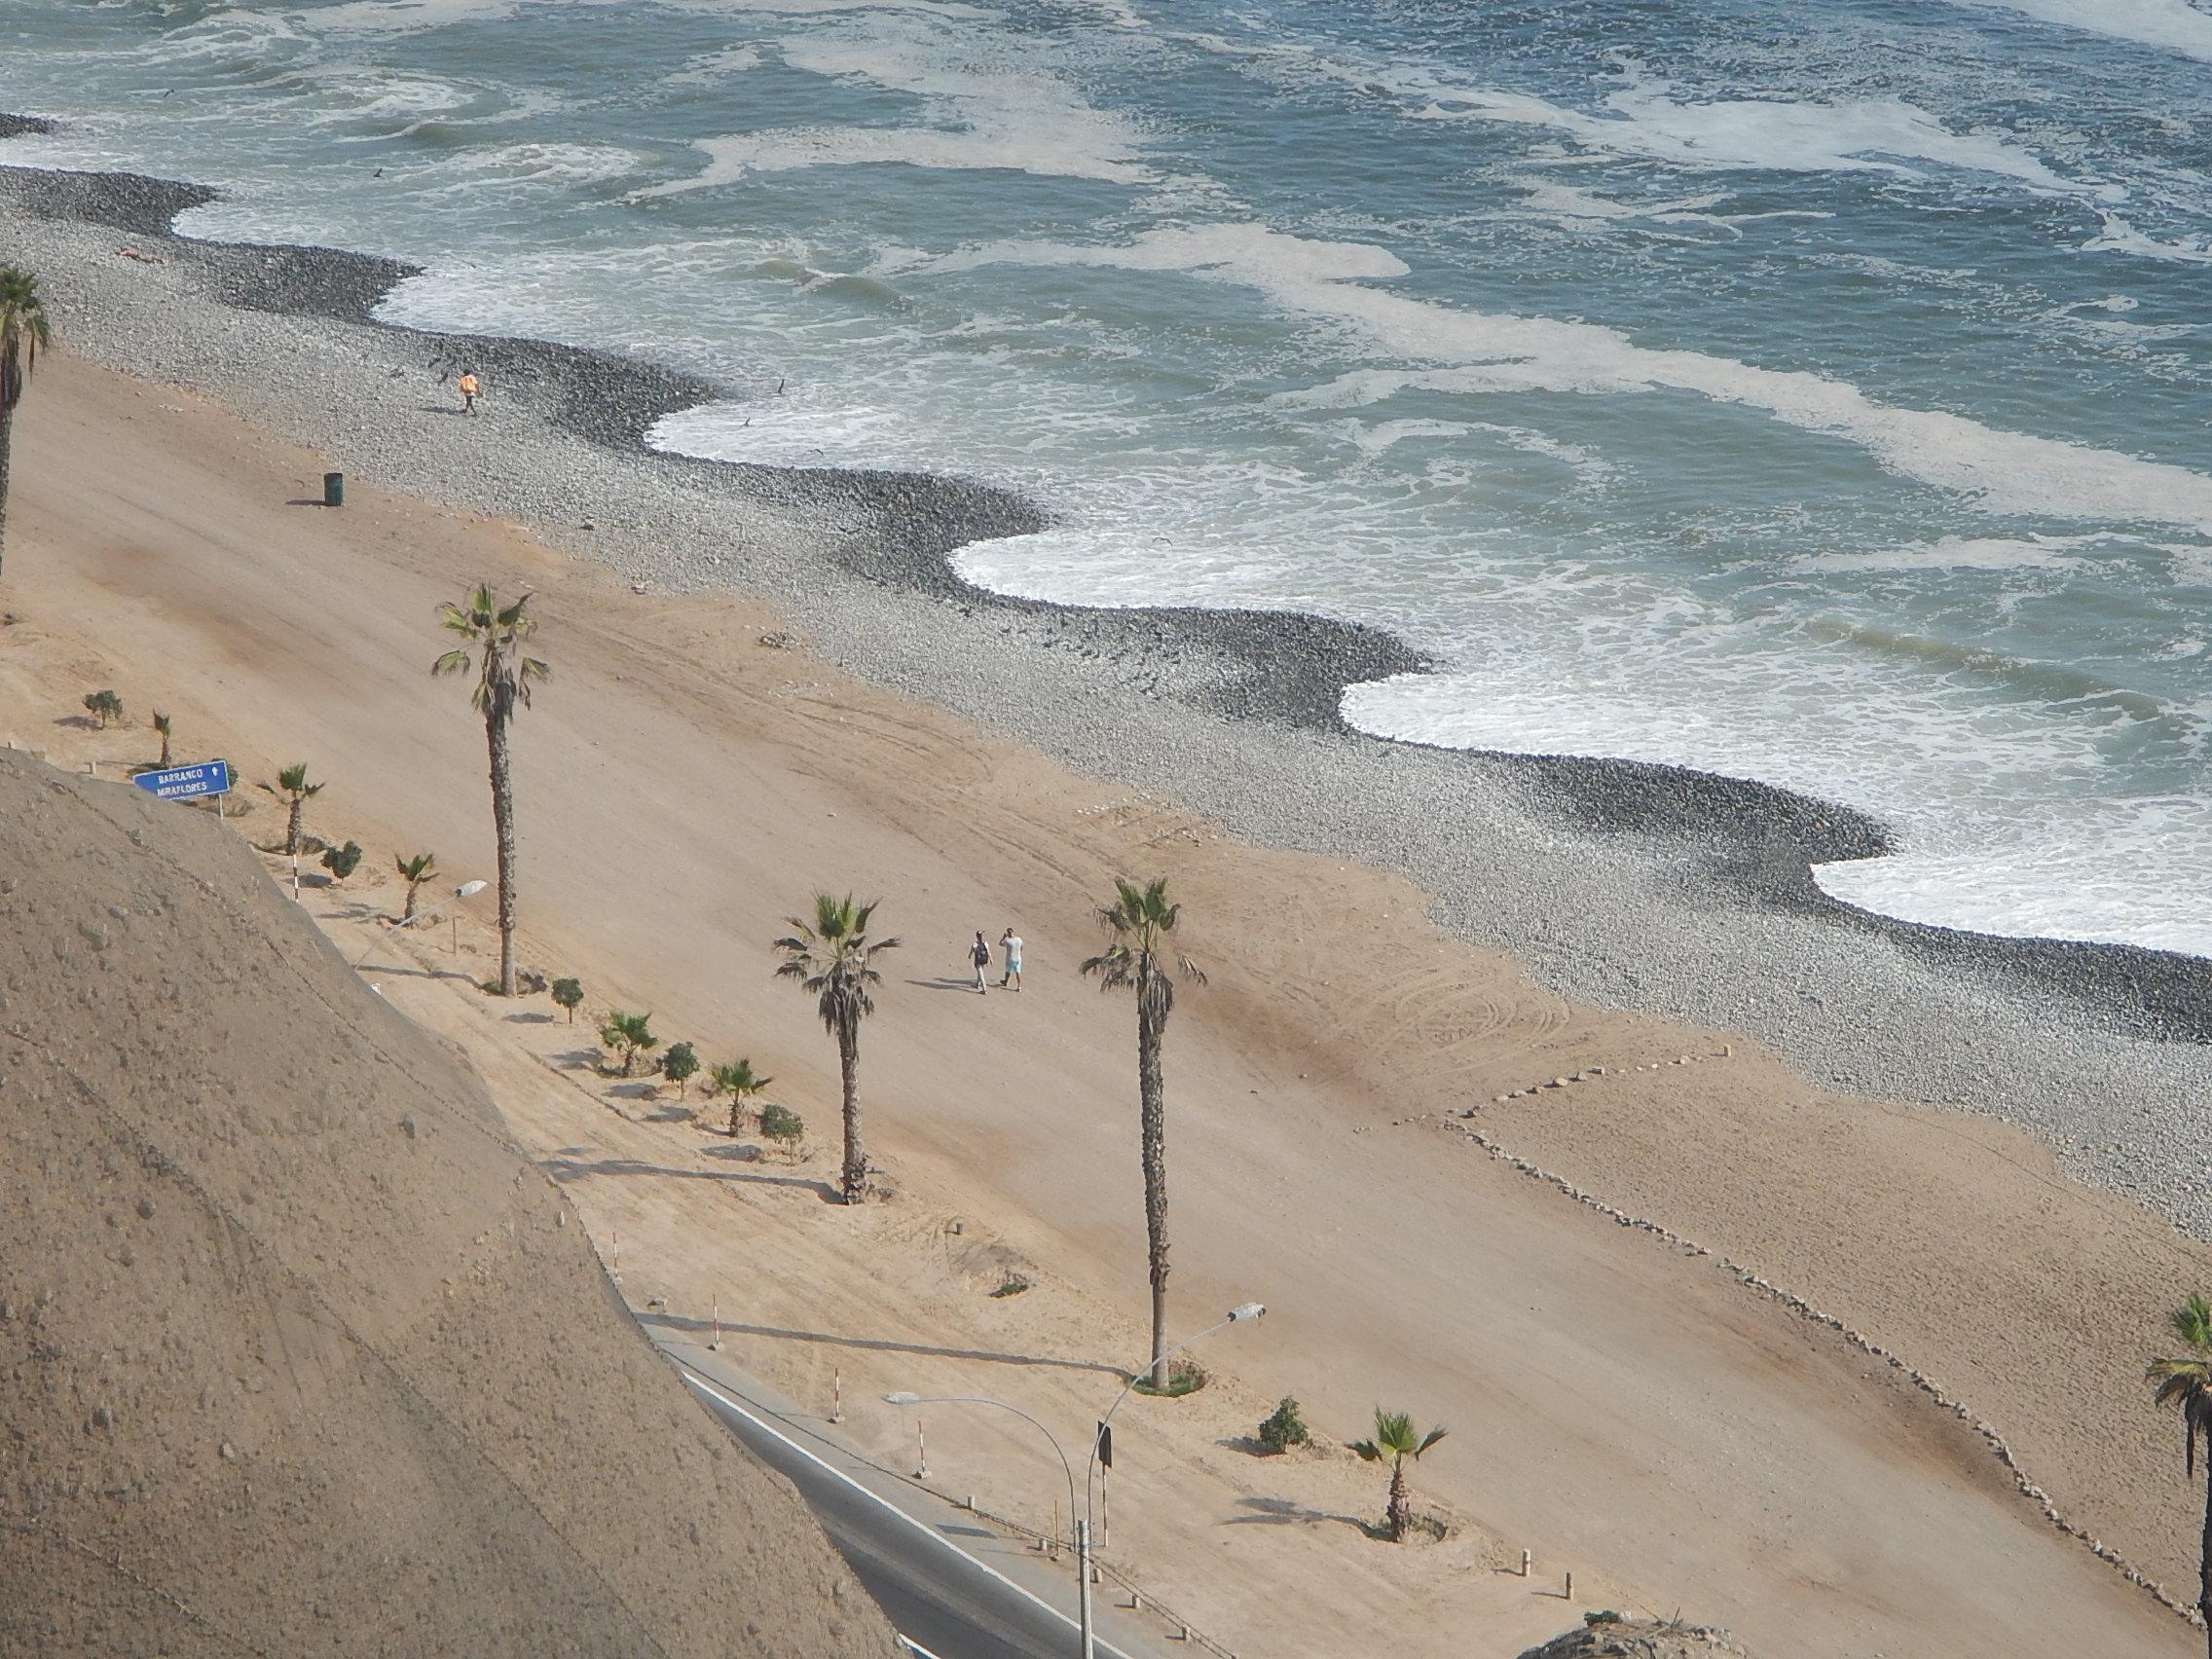 Lima's Sinusoidal Beach